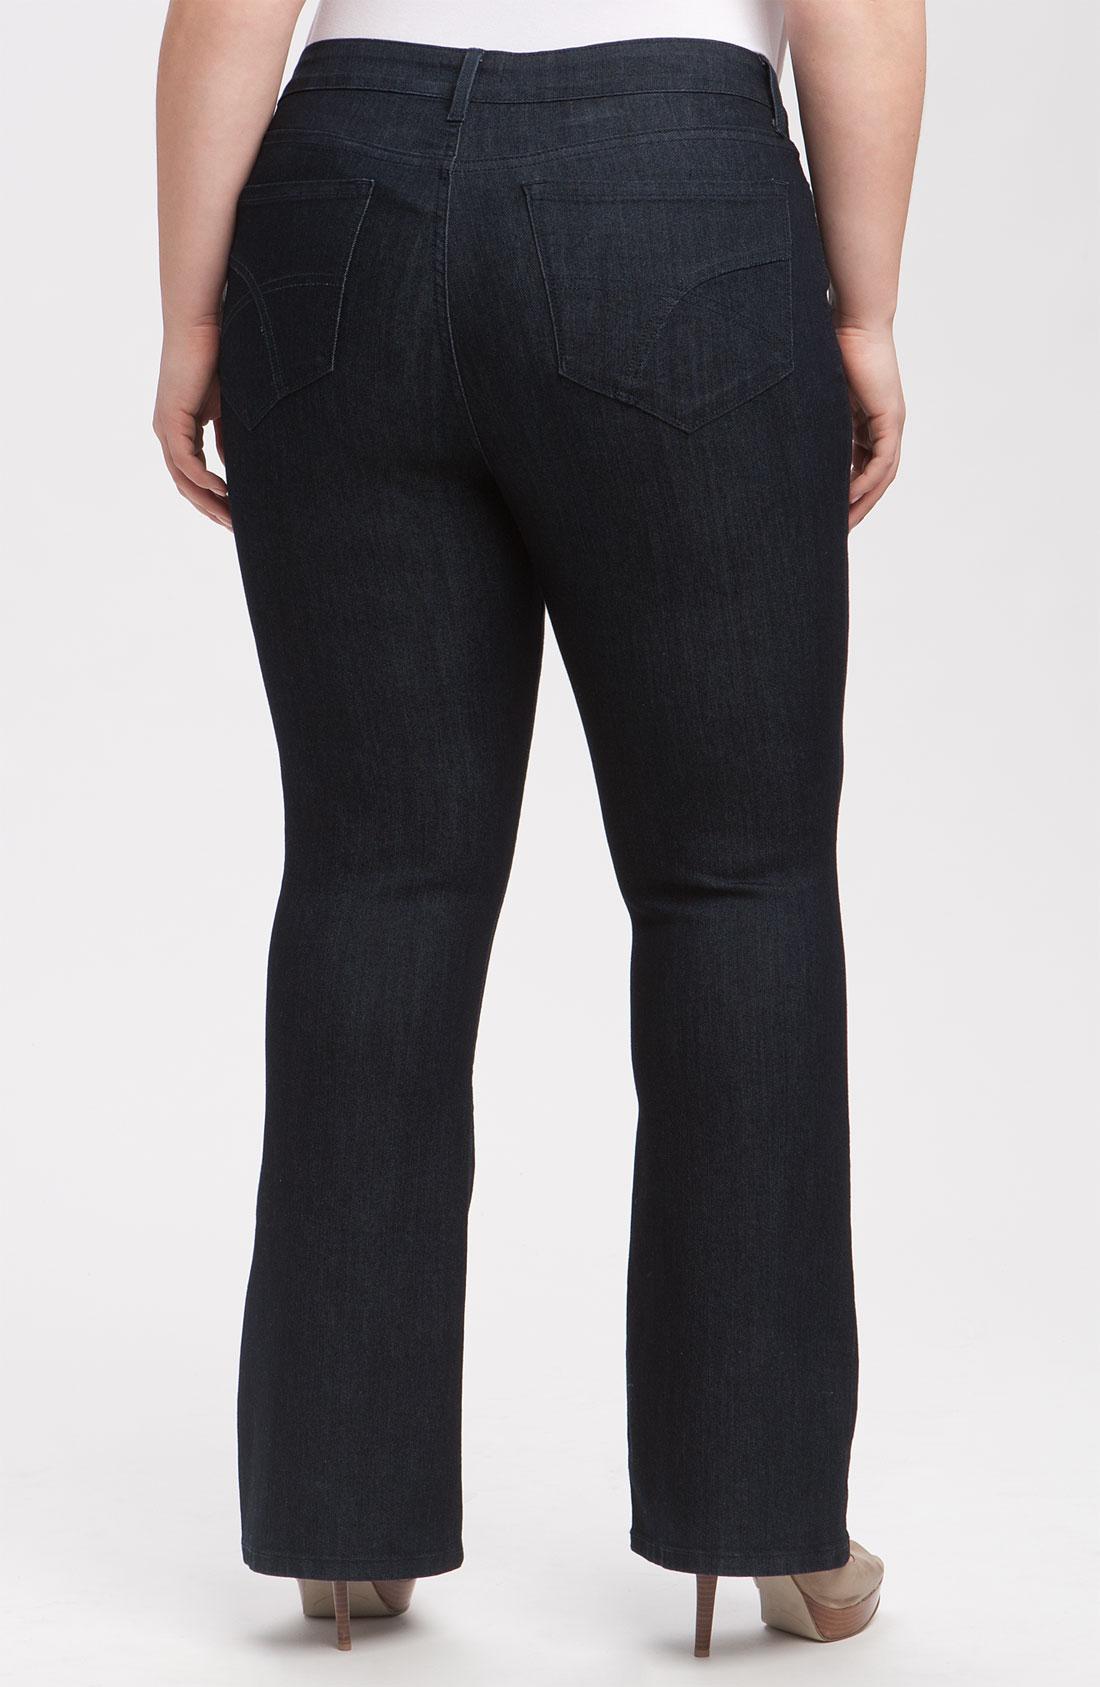 nydj 39 barbara 39 stretch bootcut jeans in black dark enzyme. Black Bedroom Furniture Sets. Home Design Ideas